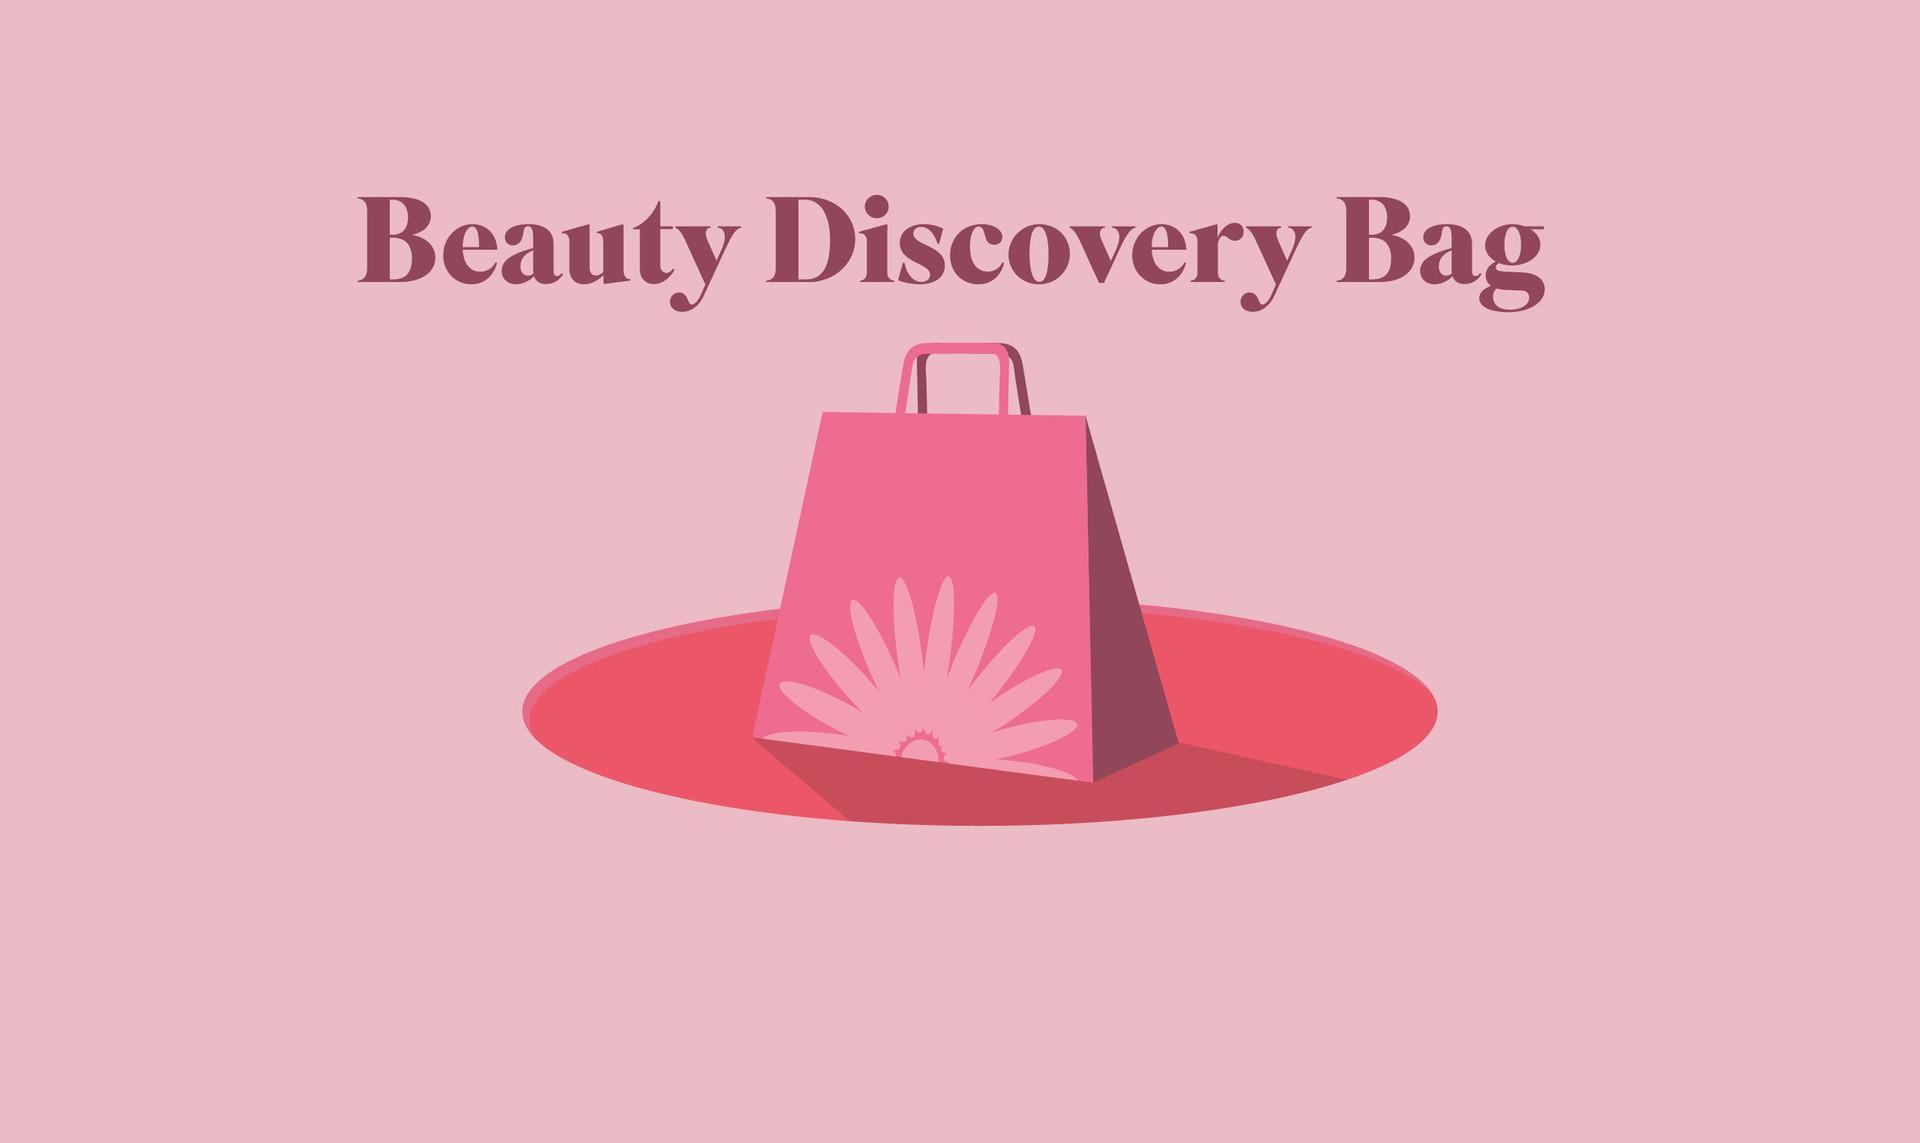 Beauty Discovery Bag